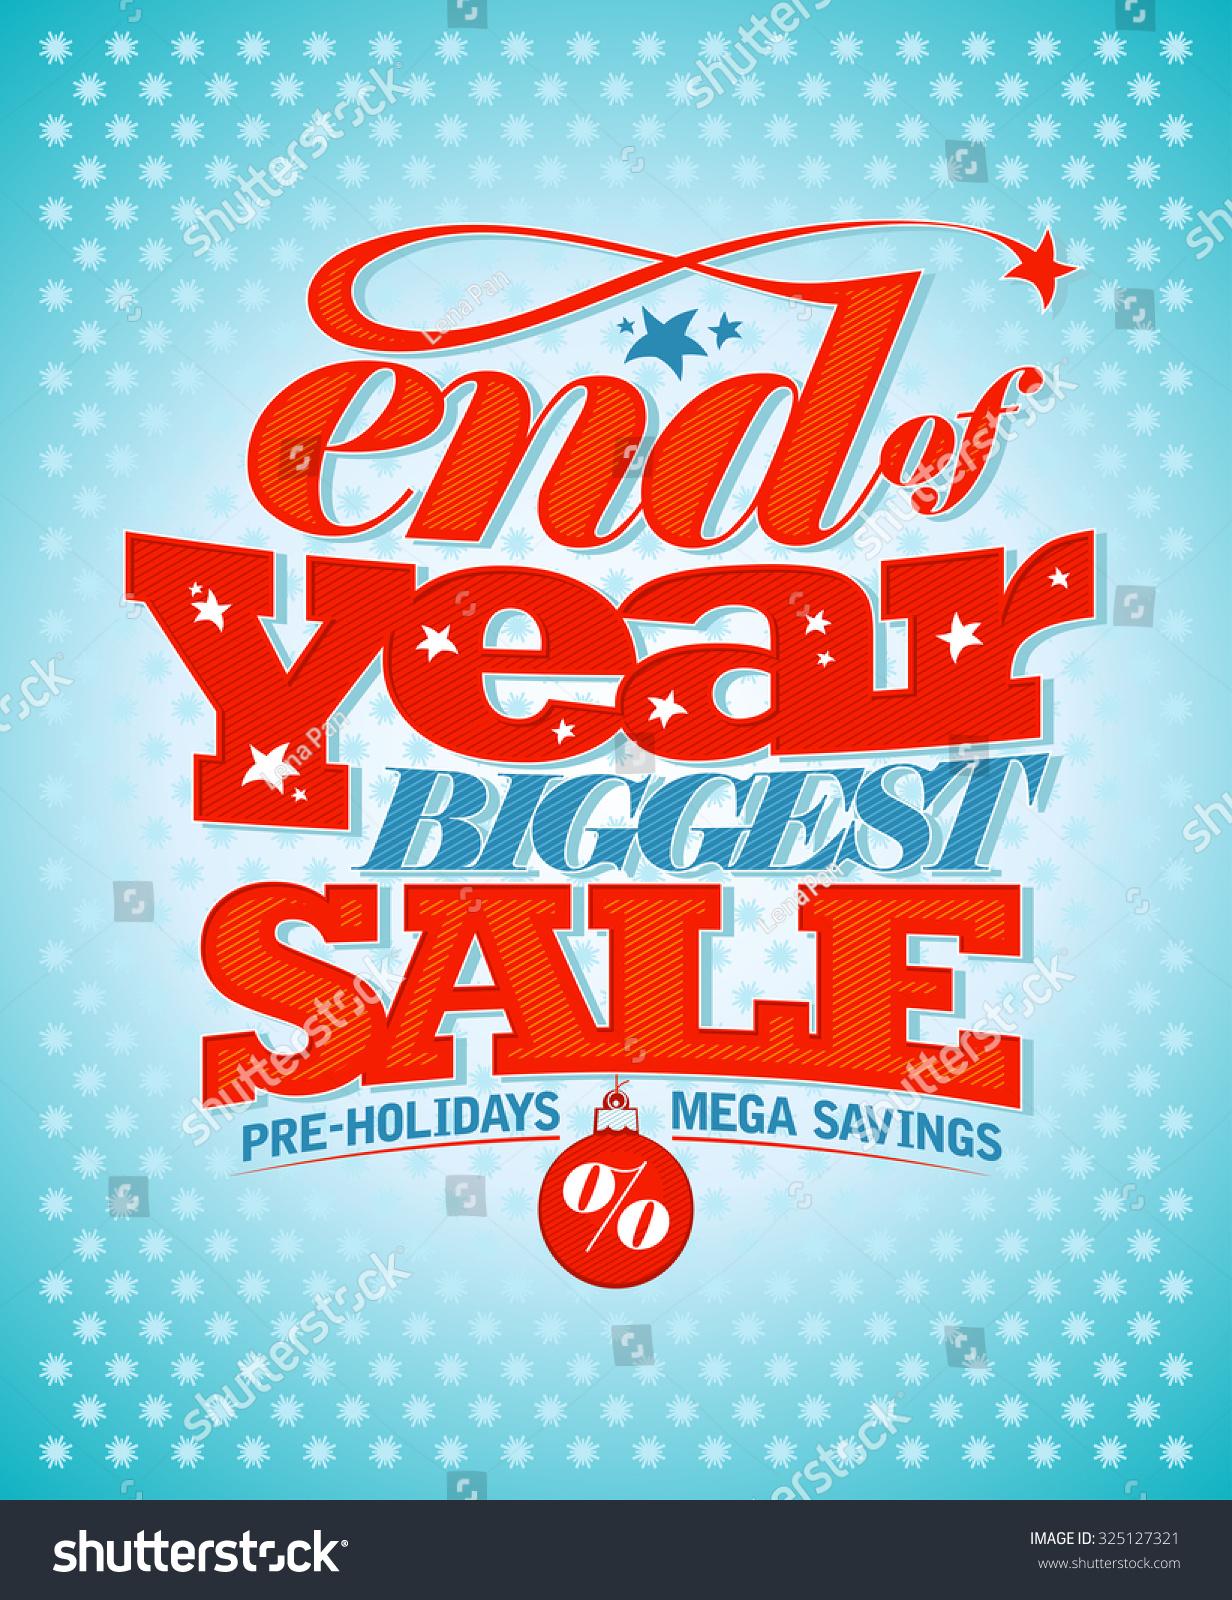 End Of Year Biggest Sale Pre Holidays Mega Savings Banner Design